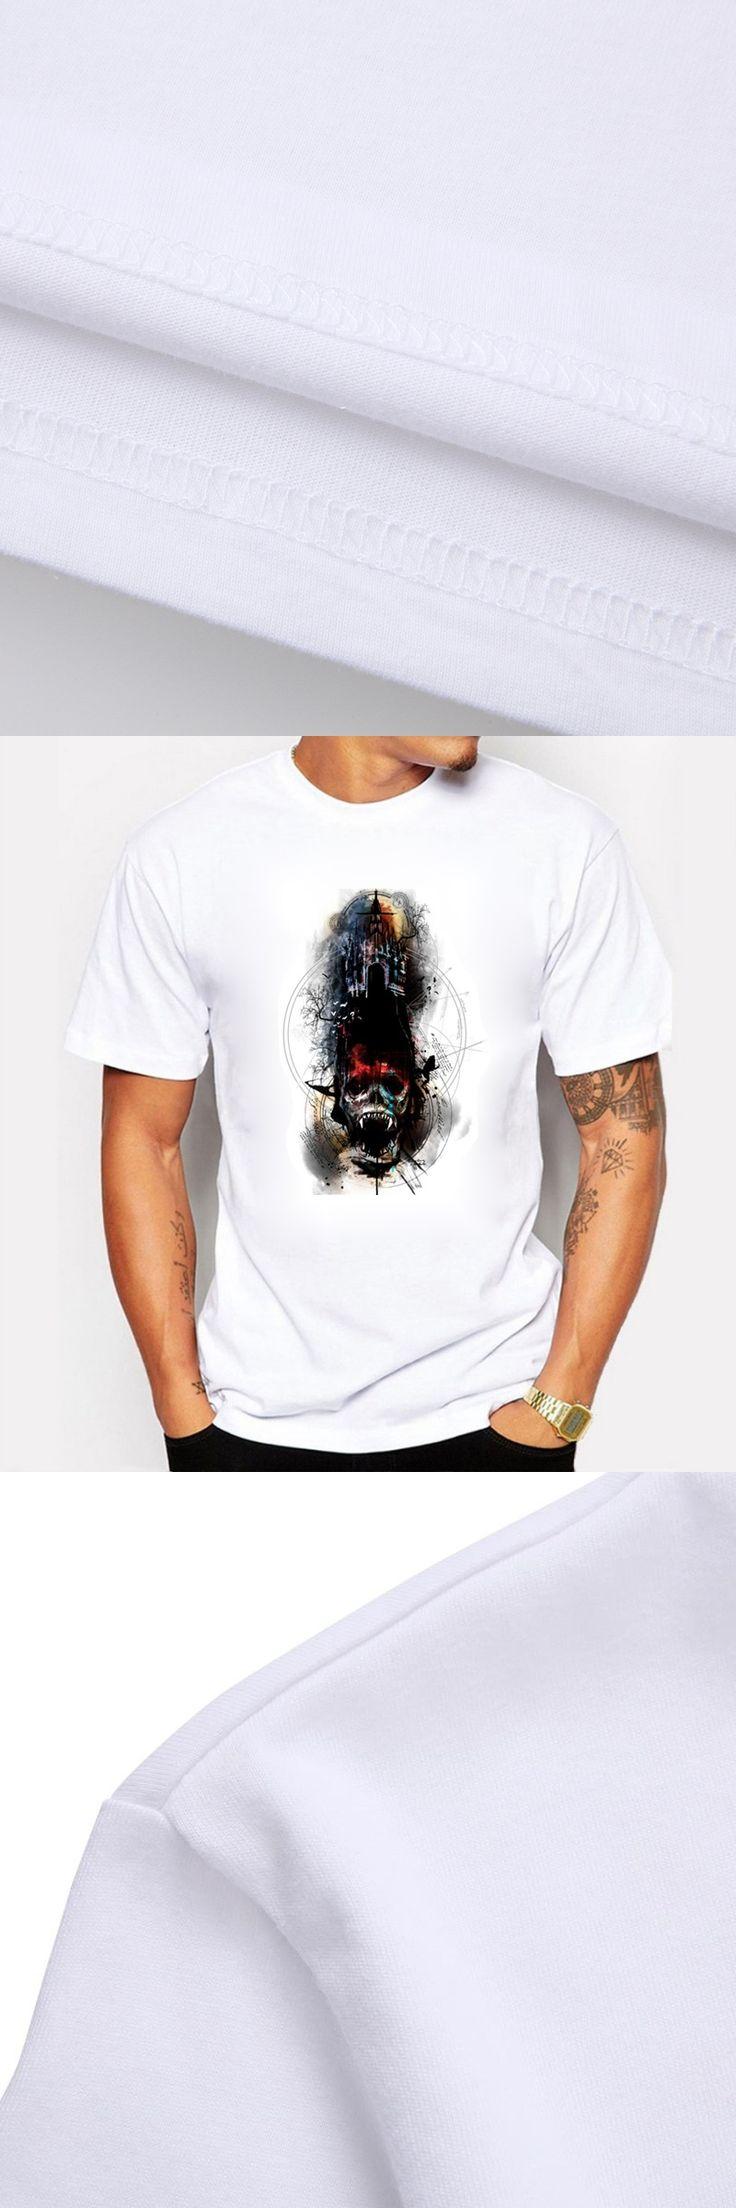 Ghost Game Throne Fashion Summer Men T Shirt Cotton Vampire Demogorgon Print  Swag O-neck T-shirt for Men